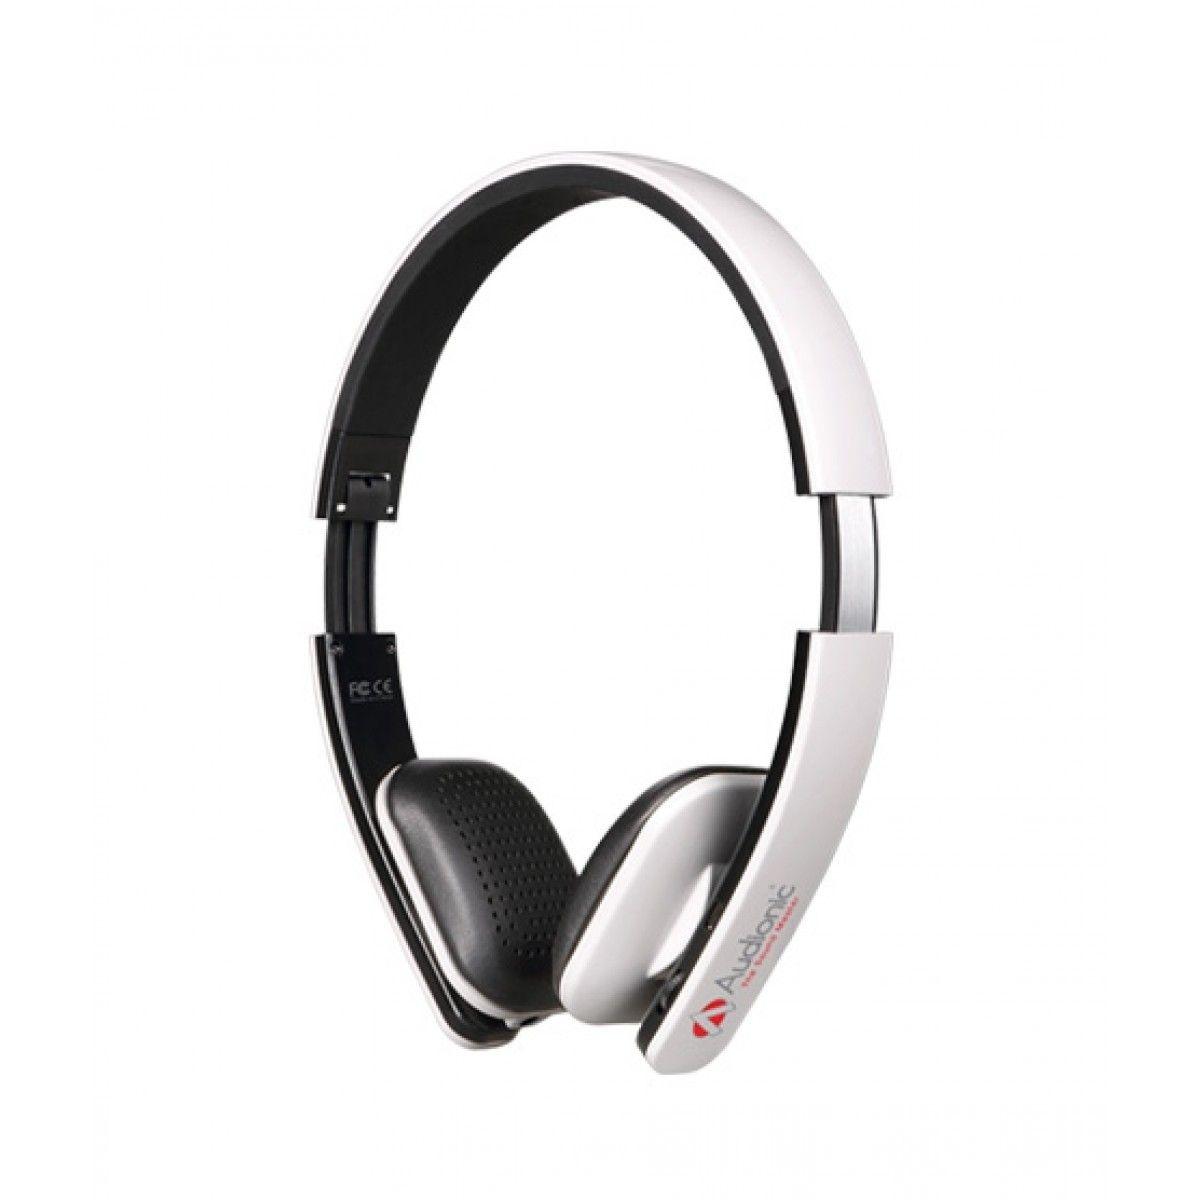 Audionic Wireless Bluetooth Headphone In 2020 Bluetooth Headphones Wireless Bluetooth Headphones Iphone Headphones